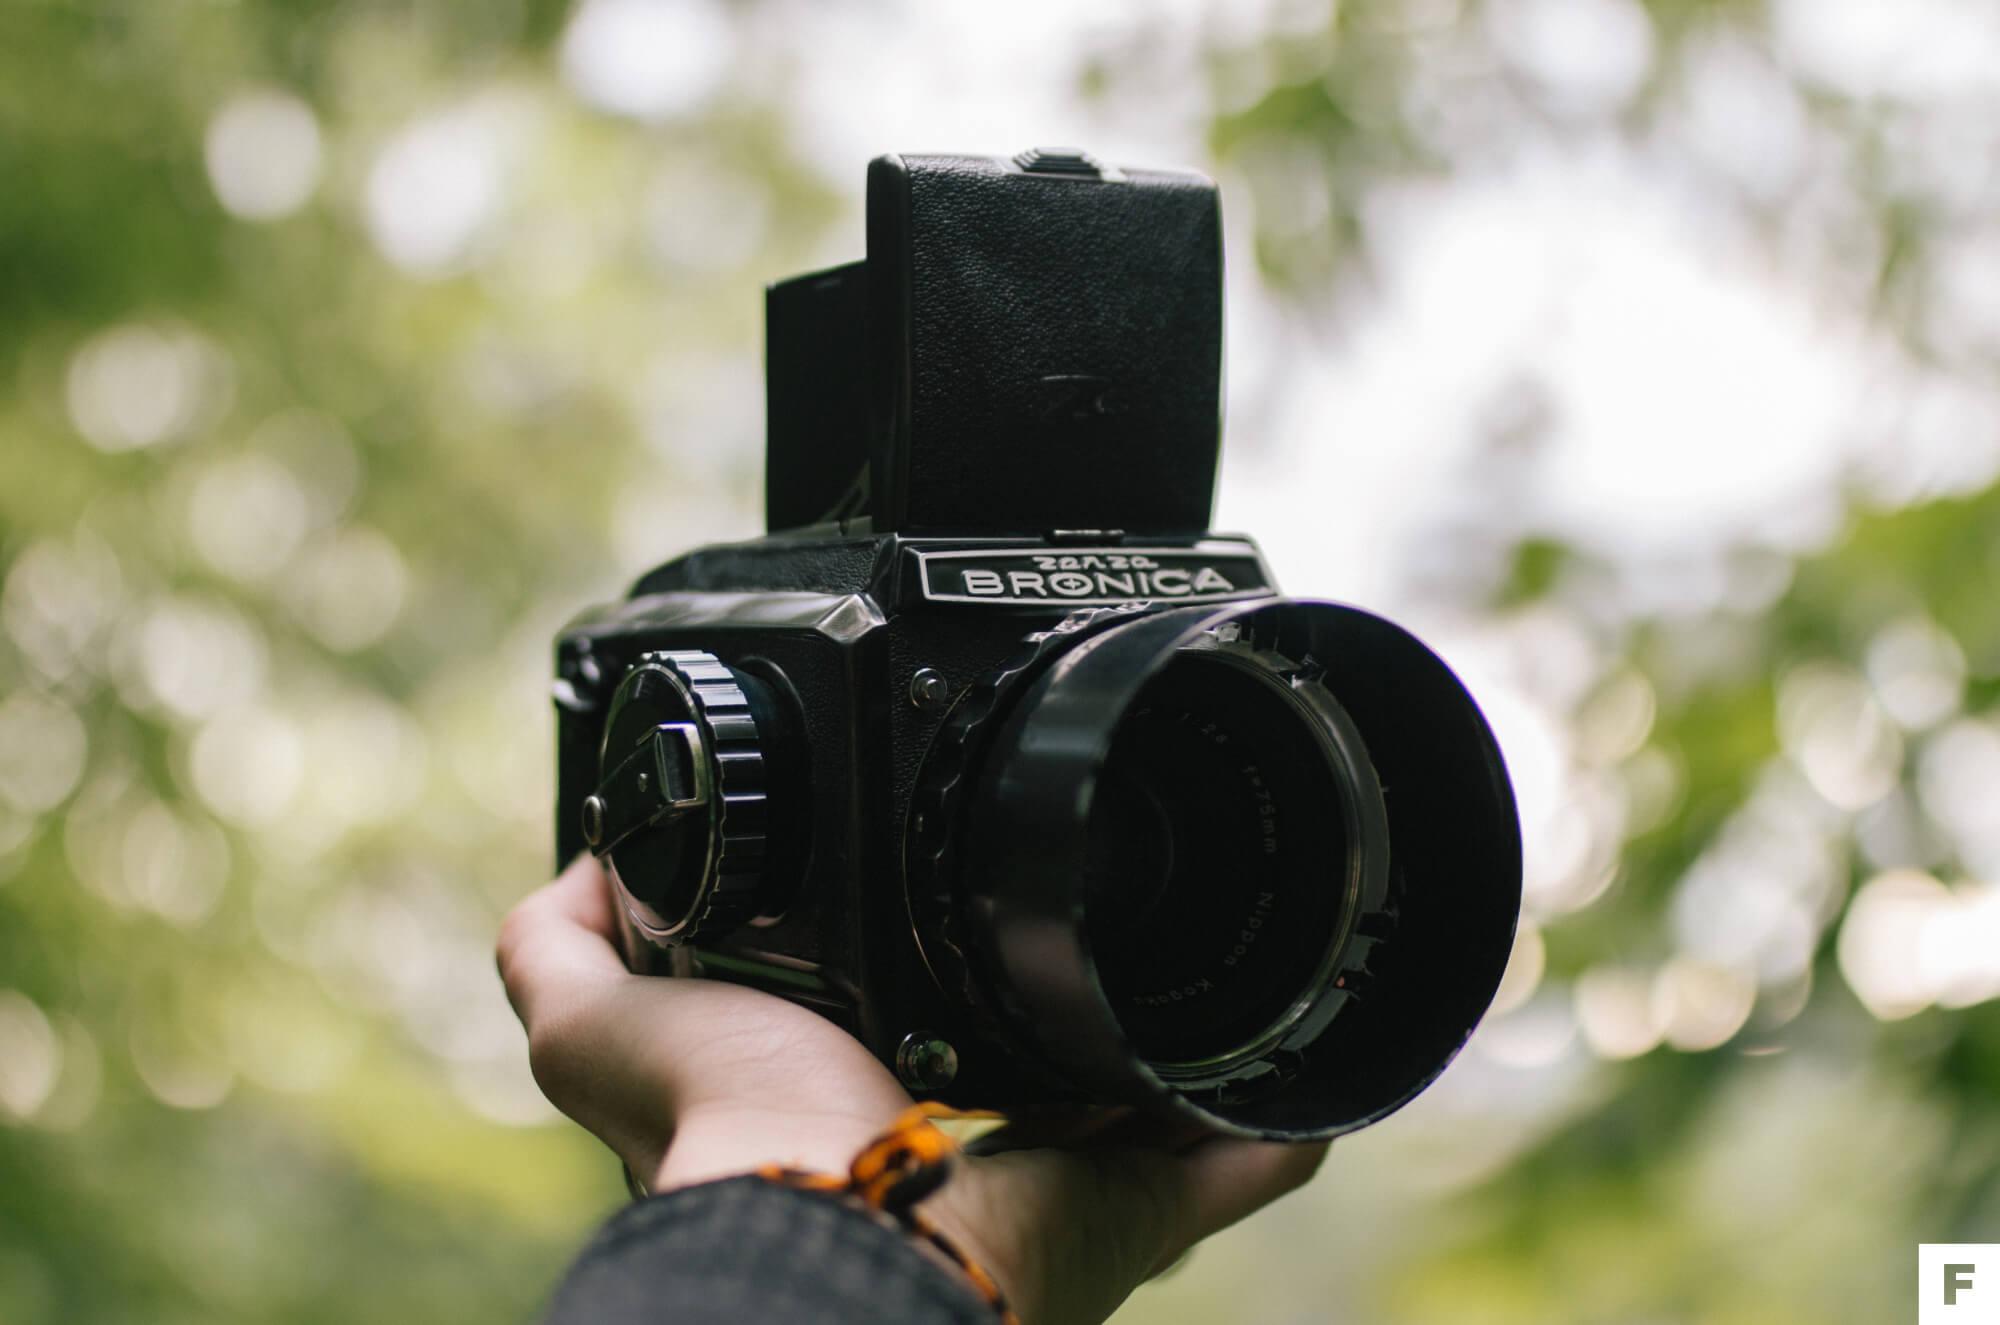 fotoaparát na film zenza bronica s2